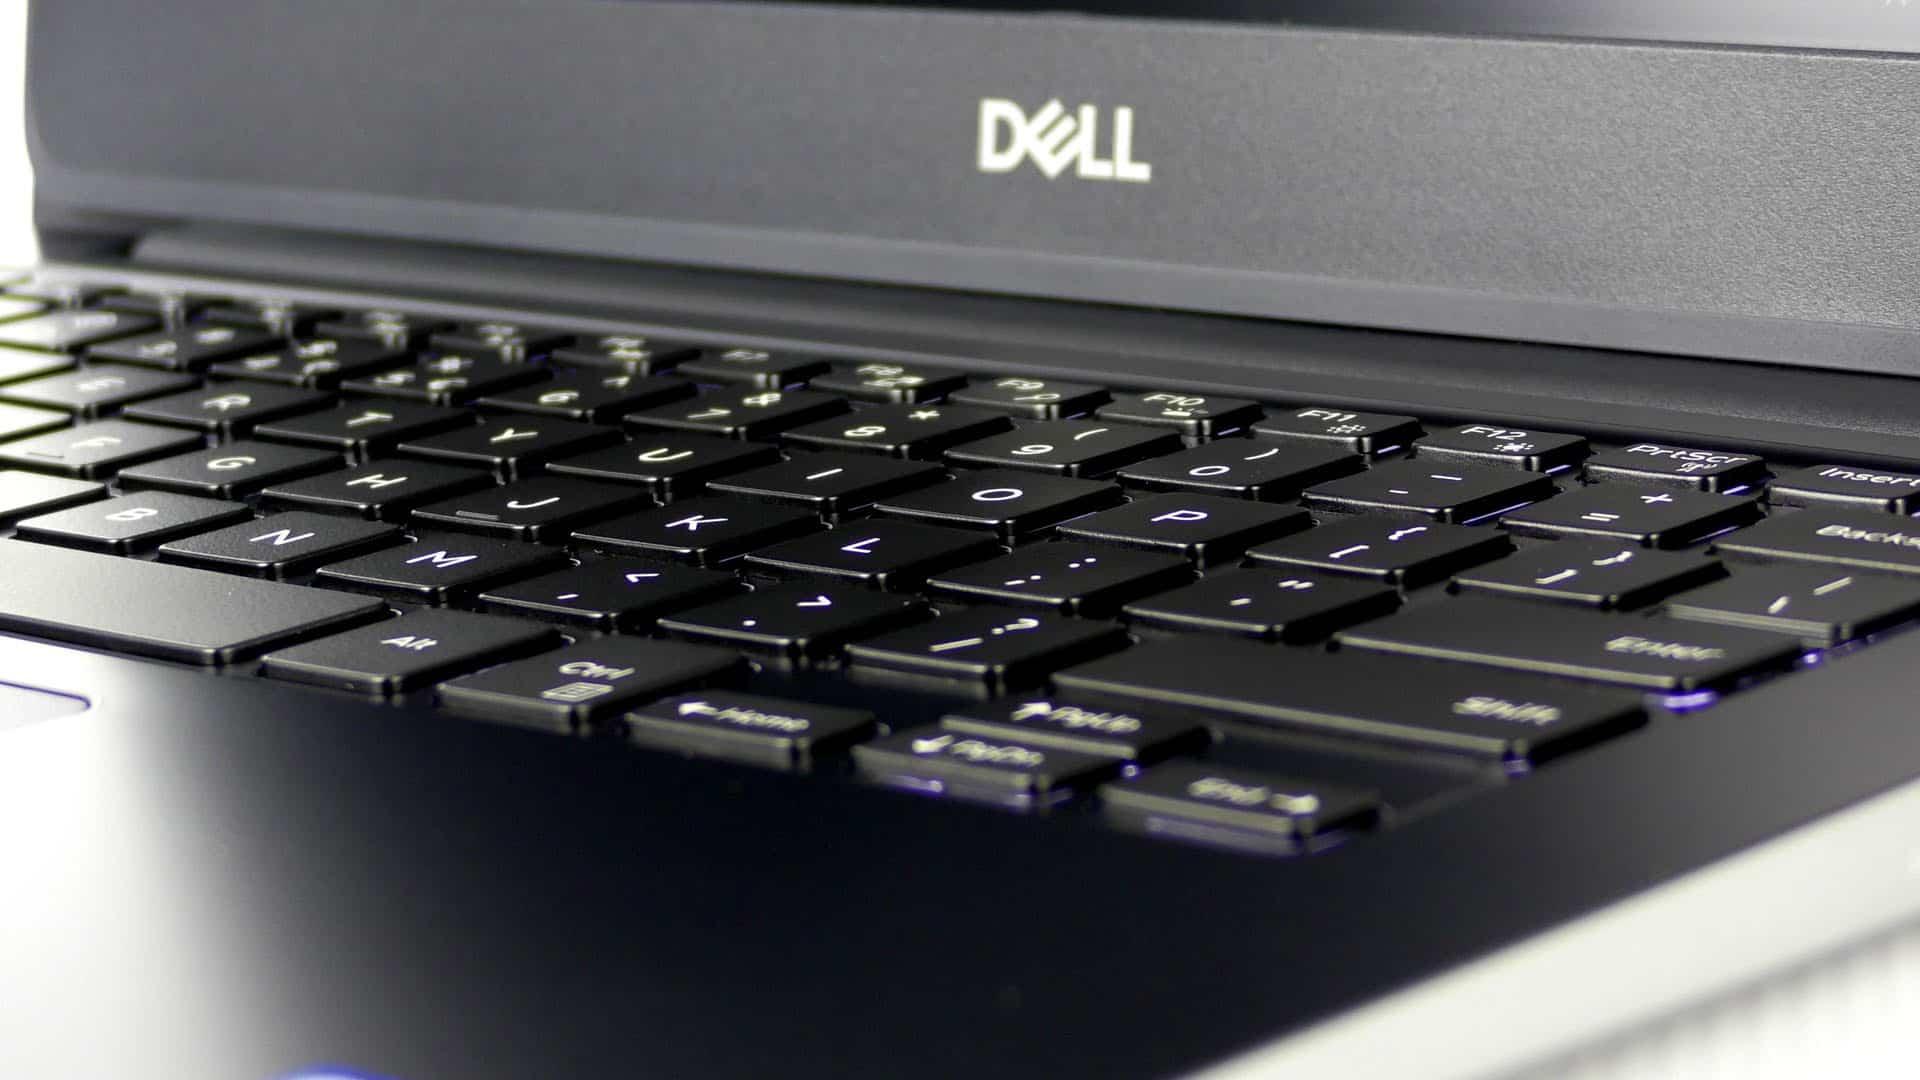 Dell Vostro 5370 - wyspowa klawiatura